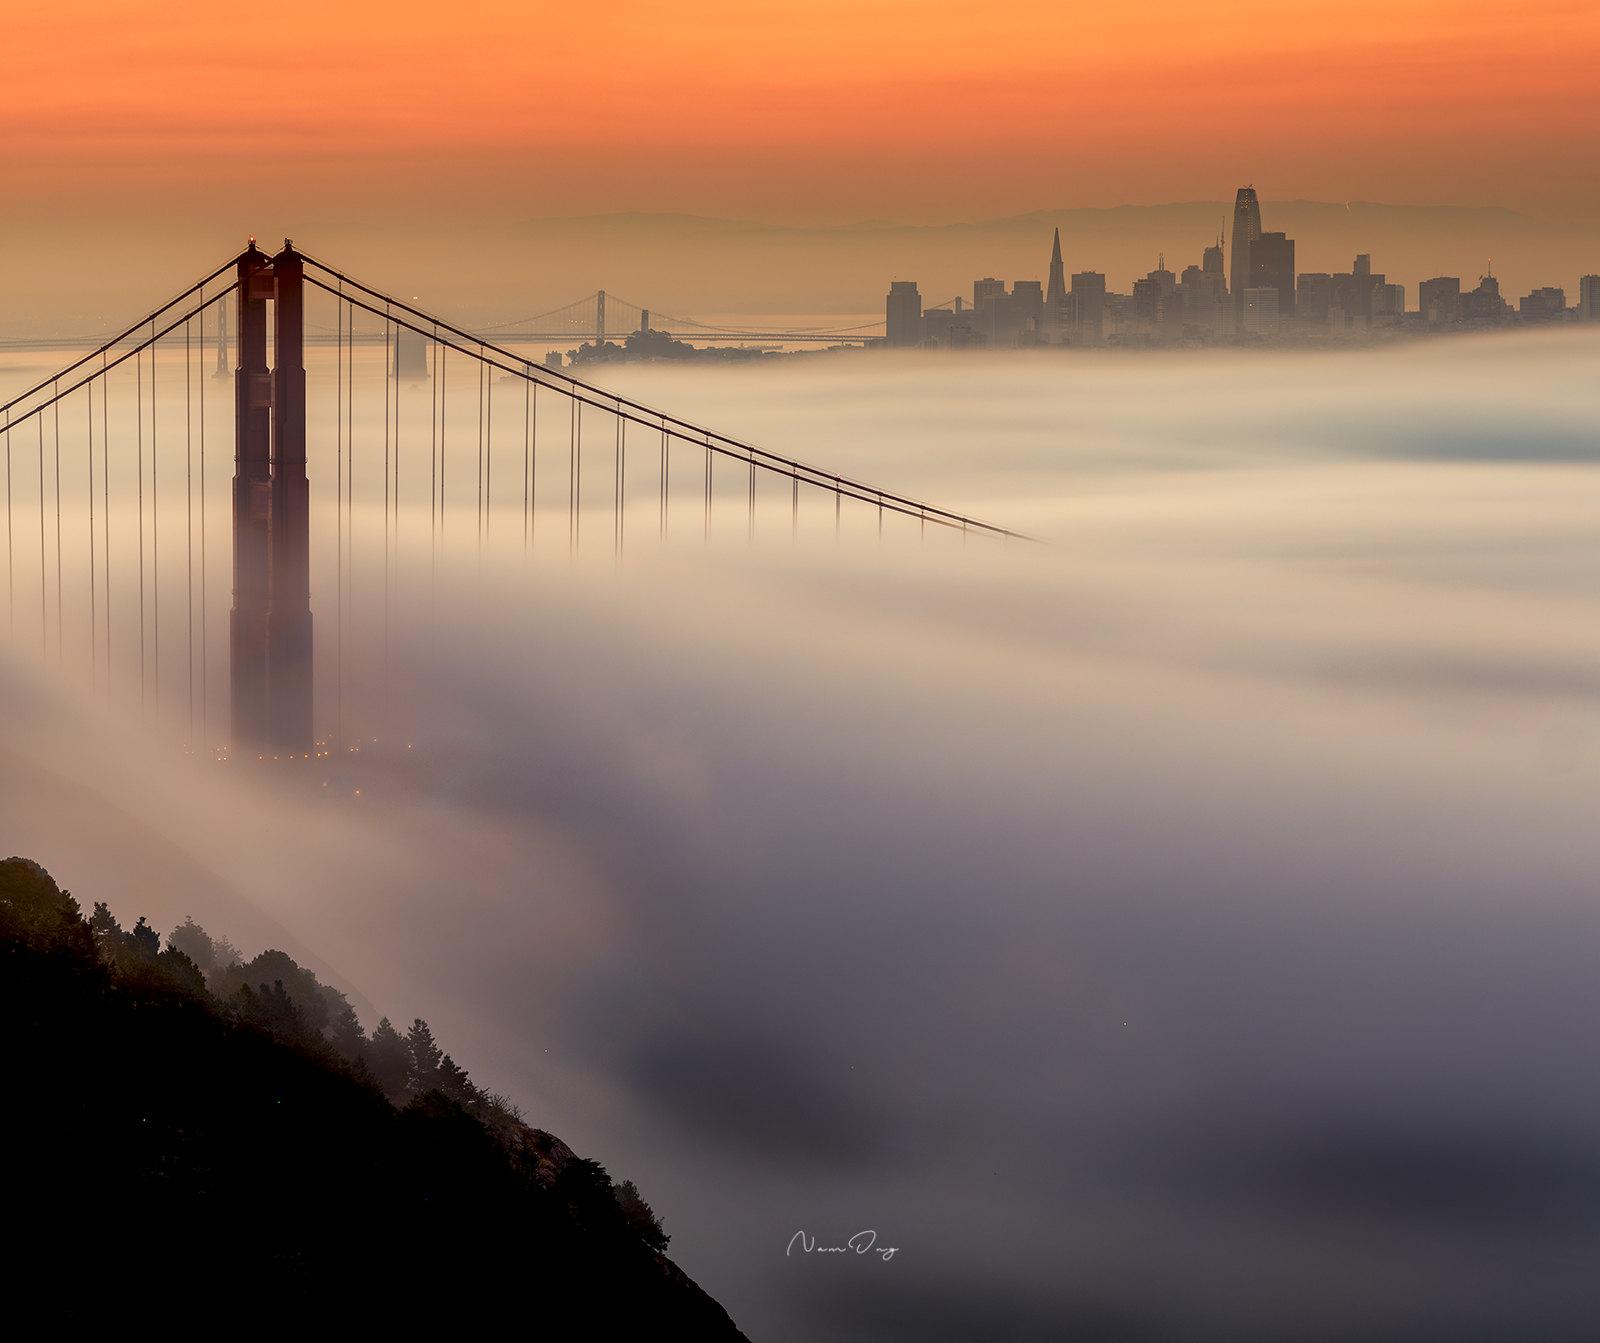 Golden Gate Bridge [+1 - 12-9-2018] 37167859245_3ef9dd5234_h